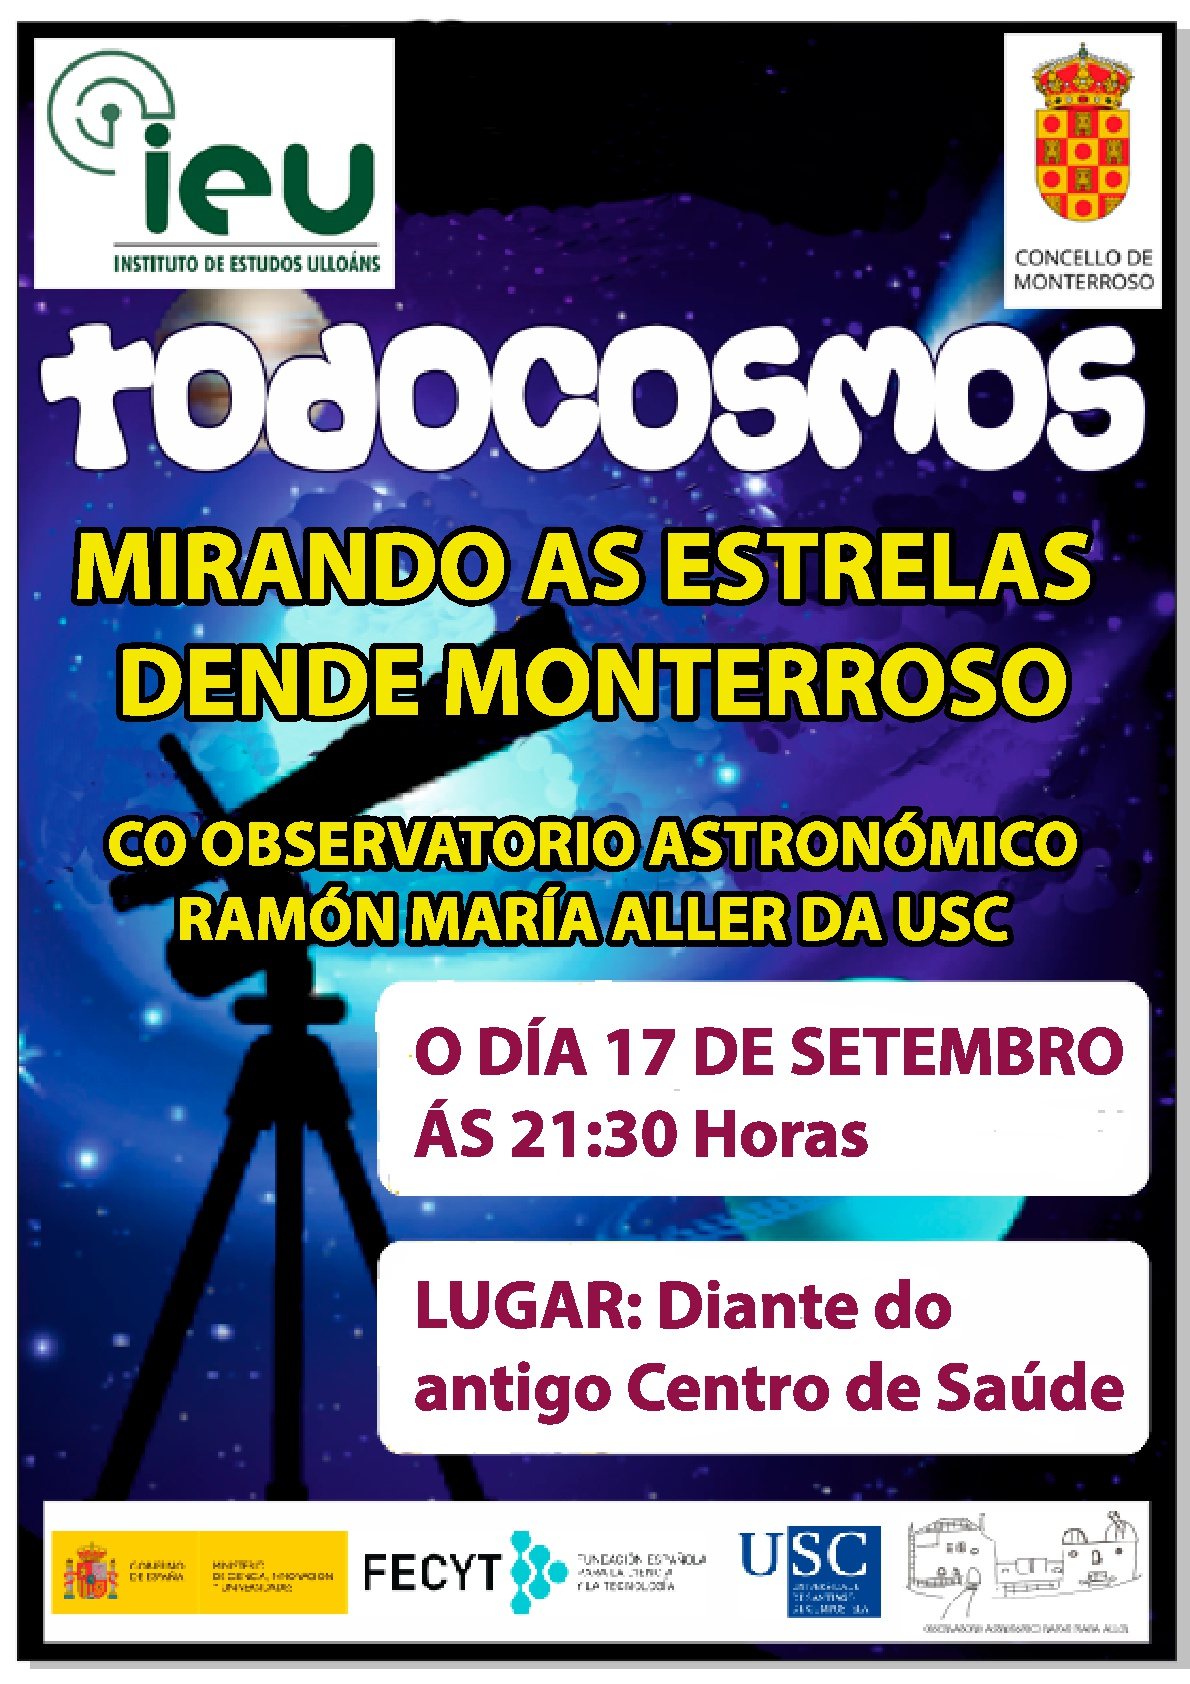 Todocosmos 17-9-2018, Observatorio Astronómico Ramón María Aller, Instituto de Estudos Ulloáns, IEU